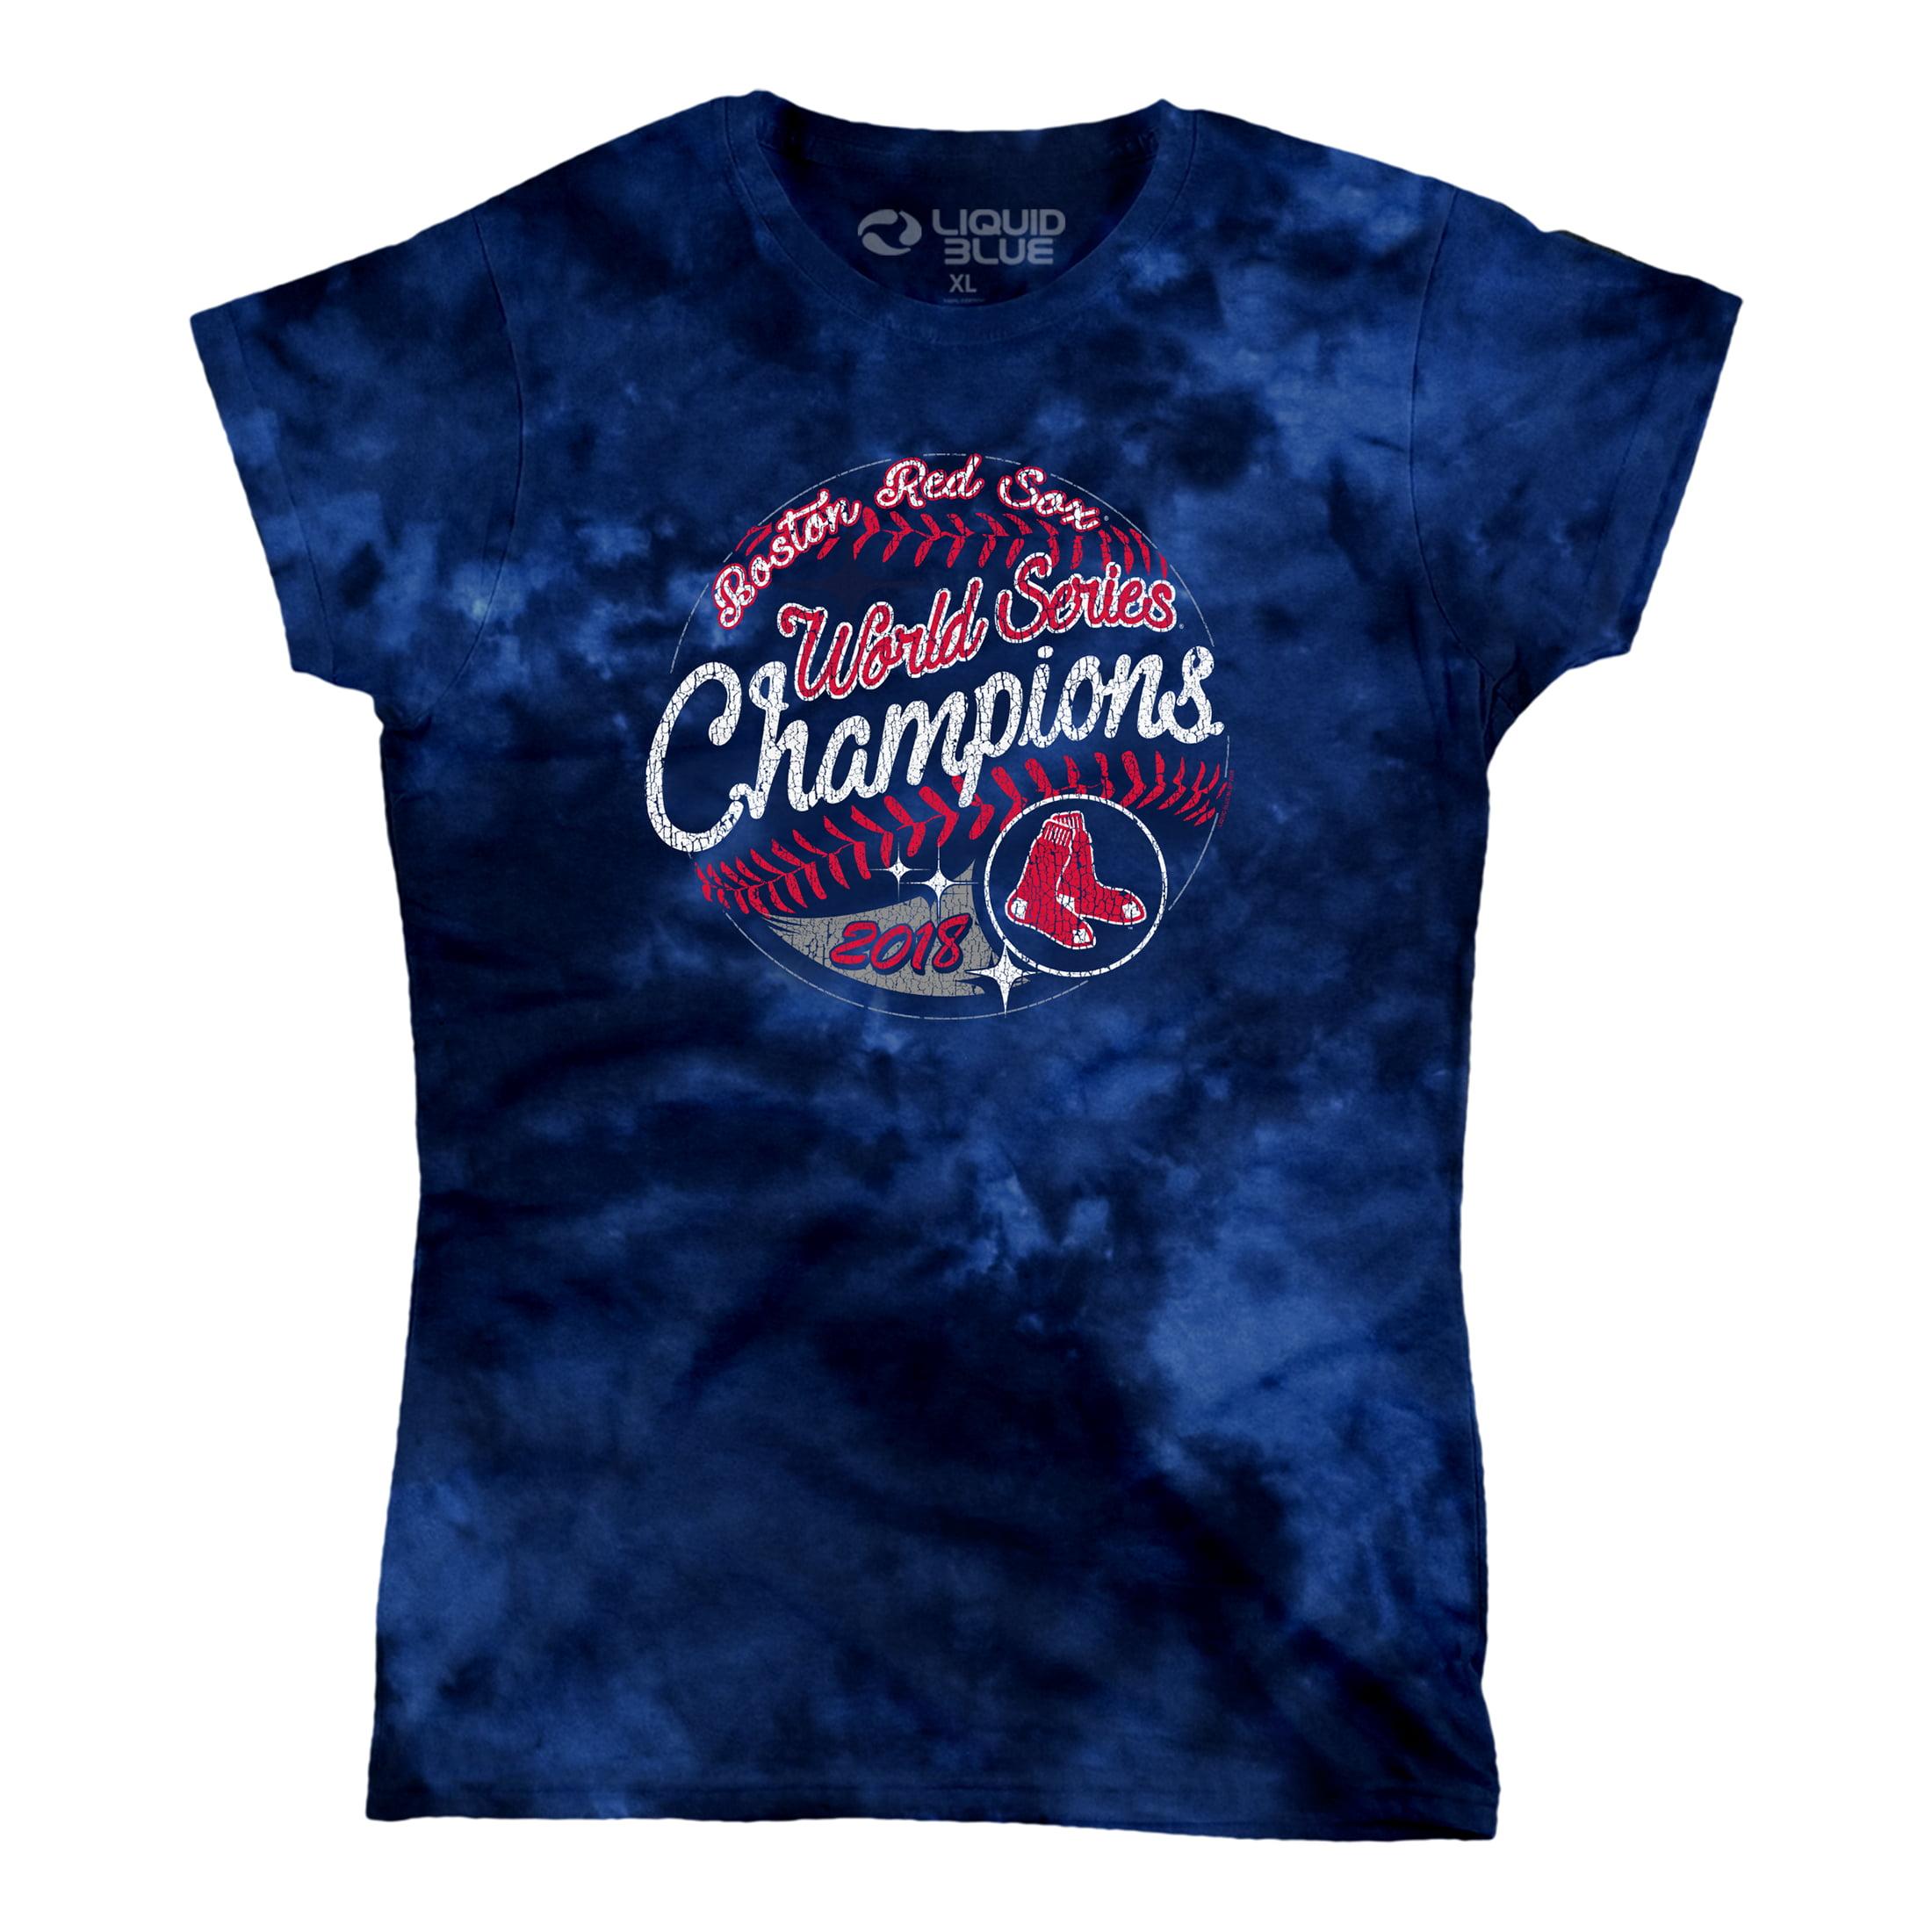 05bd8ef62 Boston Red Sox Women's 2018 World Series Champions Tie-Dye T-Shirt - Navy -  Walmart.com